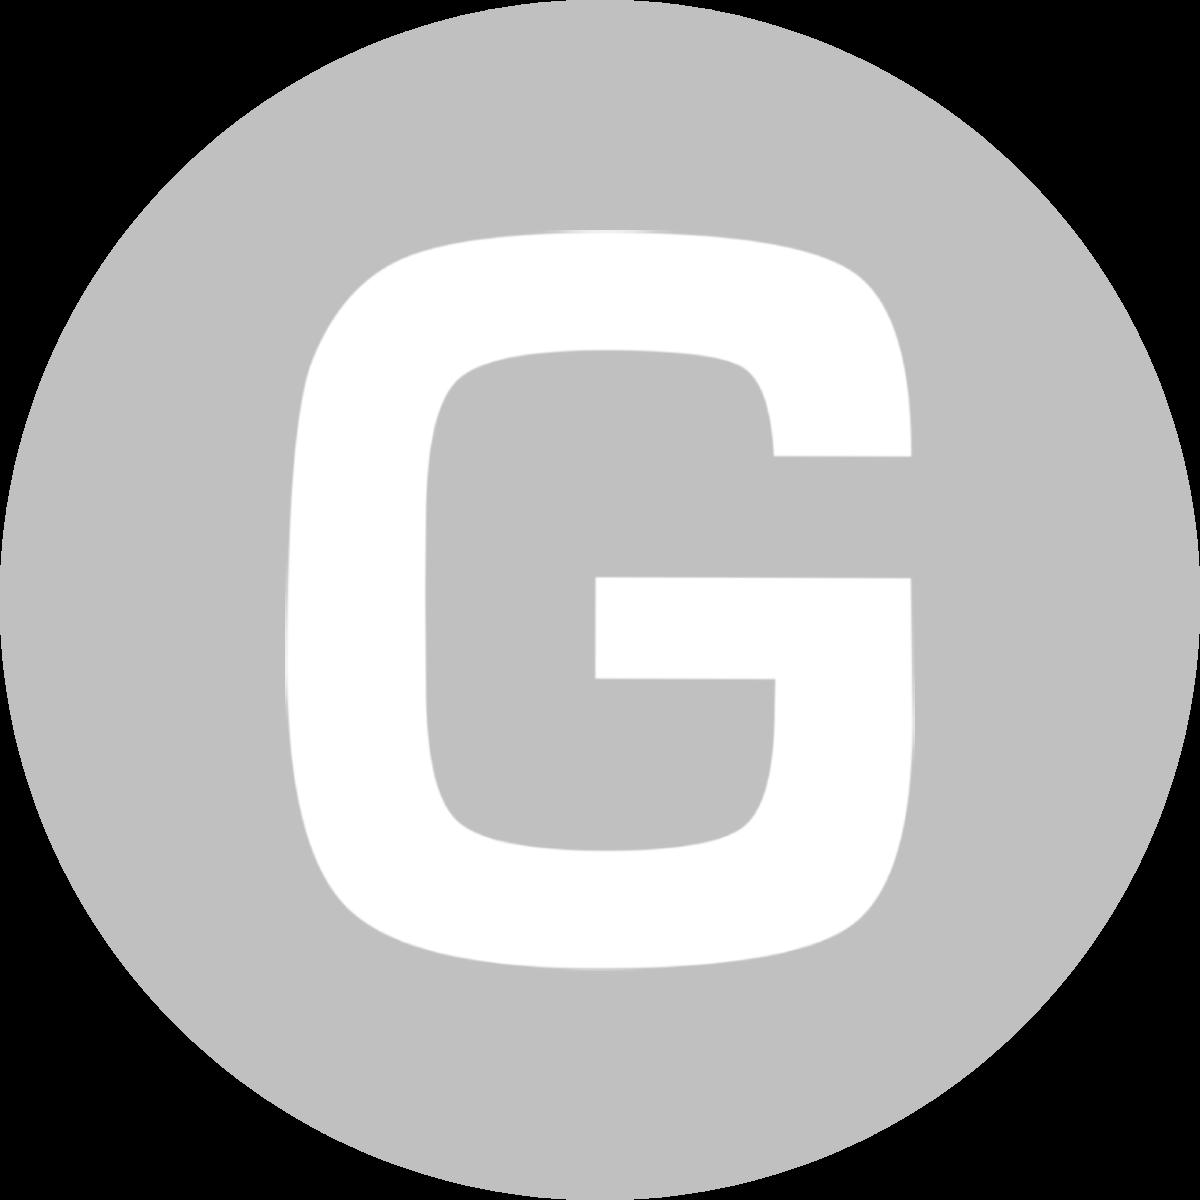 Adidas Sko CODECHAOS Grå/Hvit/Sort